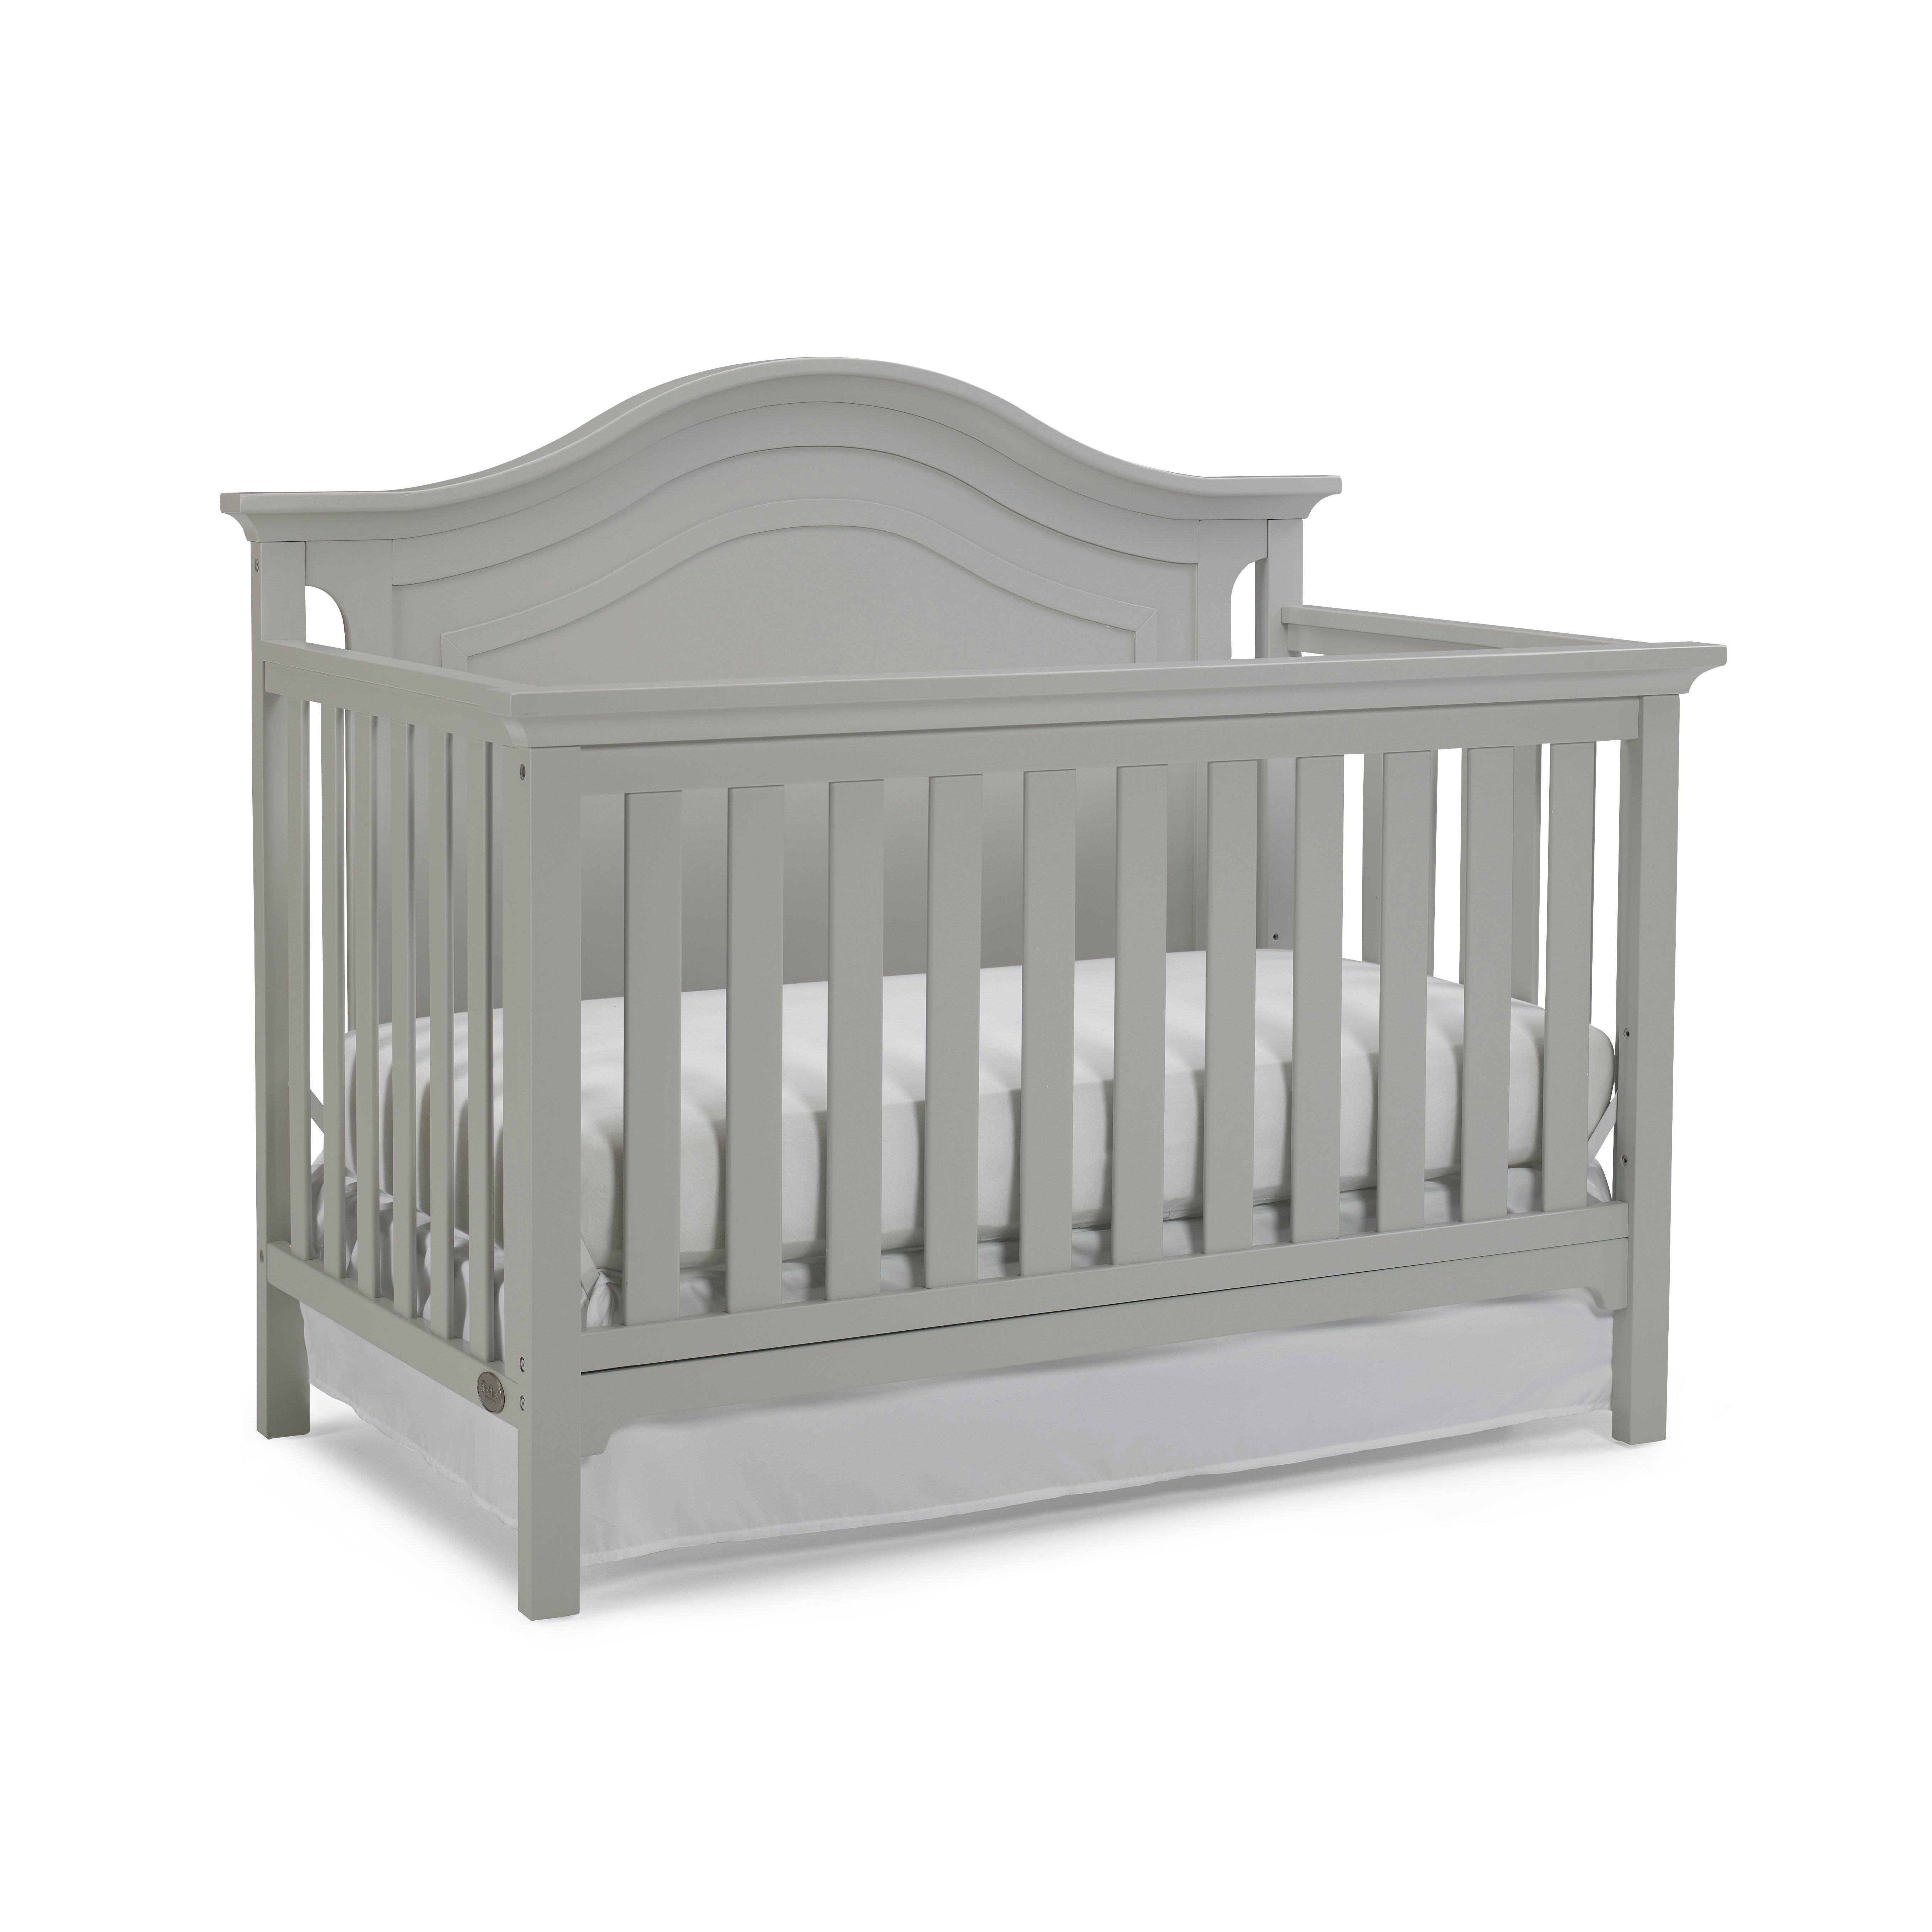 Crib for sale san diego - Ti Amo Catania 4 In 1 Convertible Crib